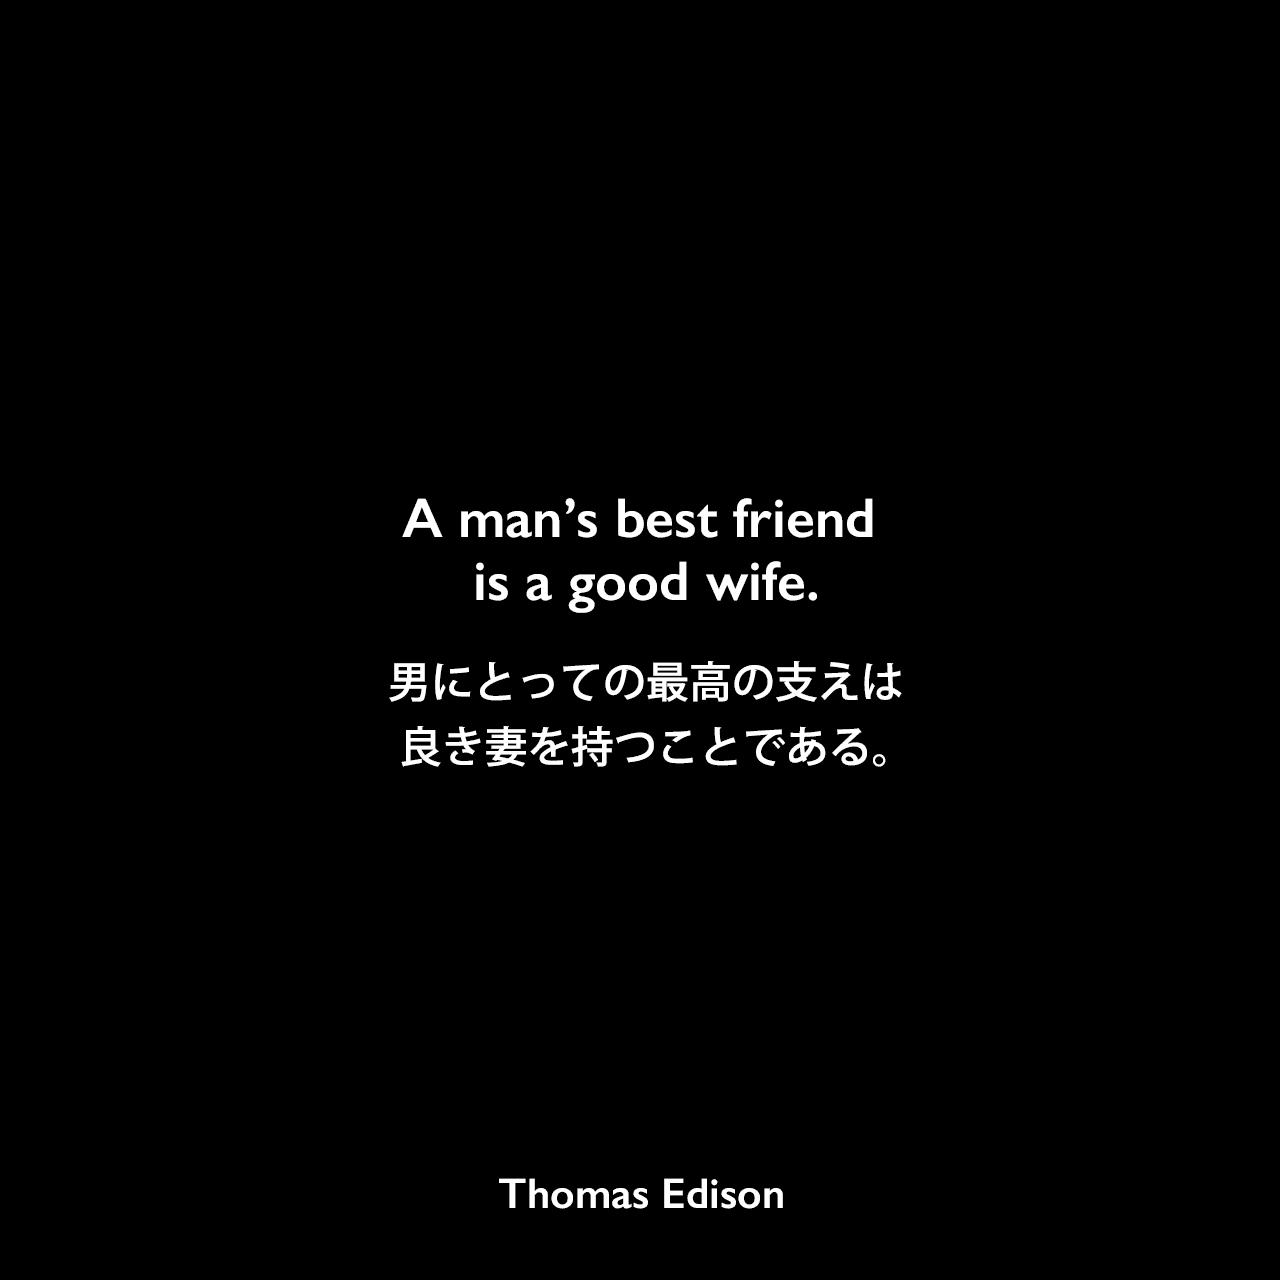 A man's best friend is a good wife.男にとっての最高の支えは、良き妻を持つことである。